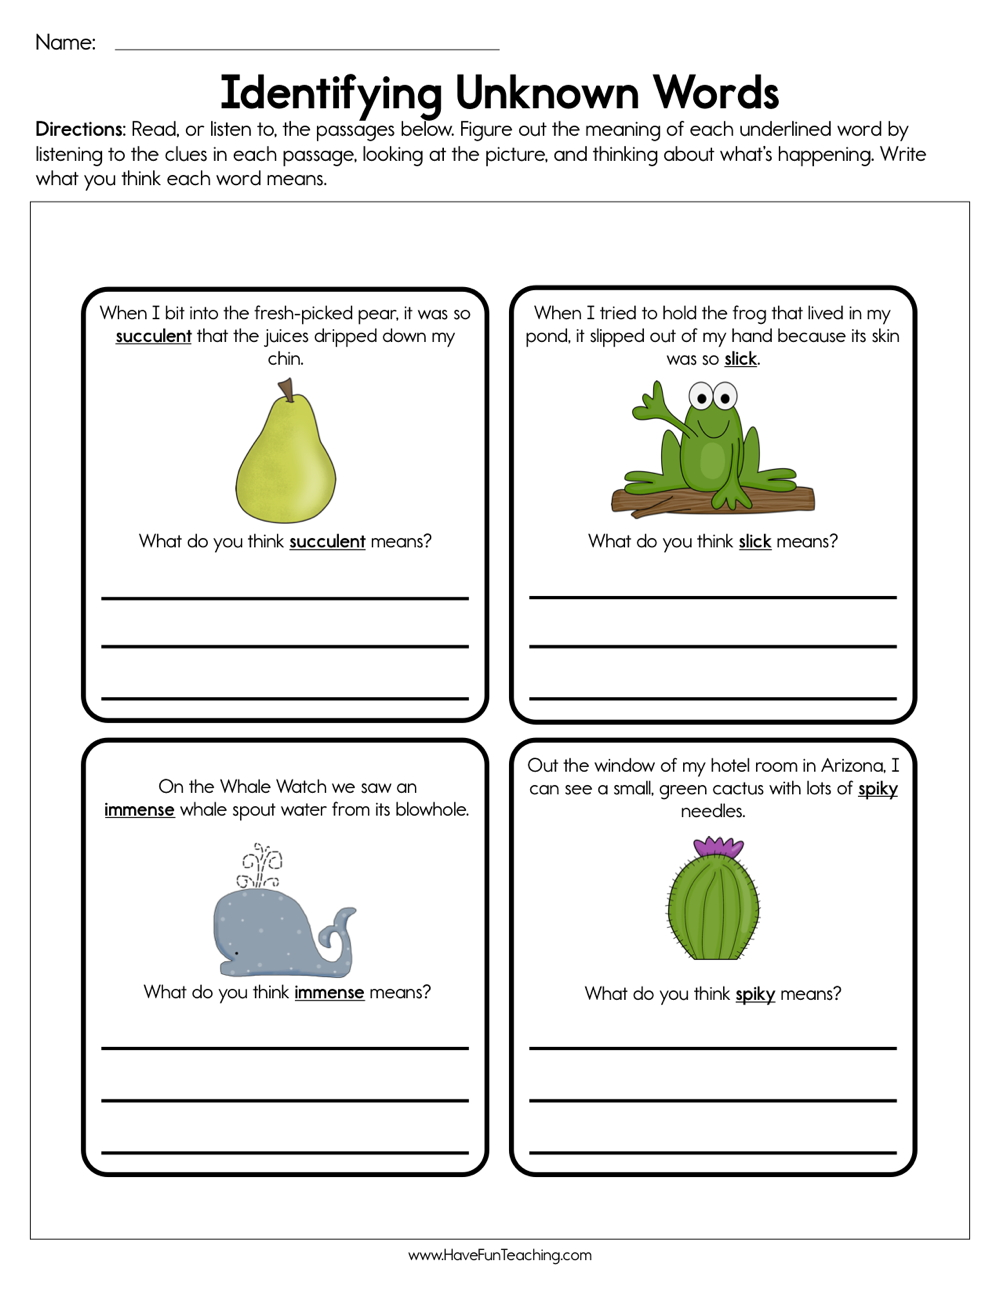 medium resolution of Identifying Unknown Words Worksheet • Have Fun Teaching